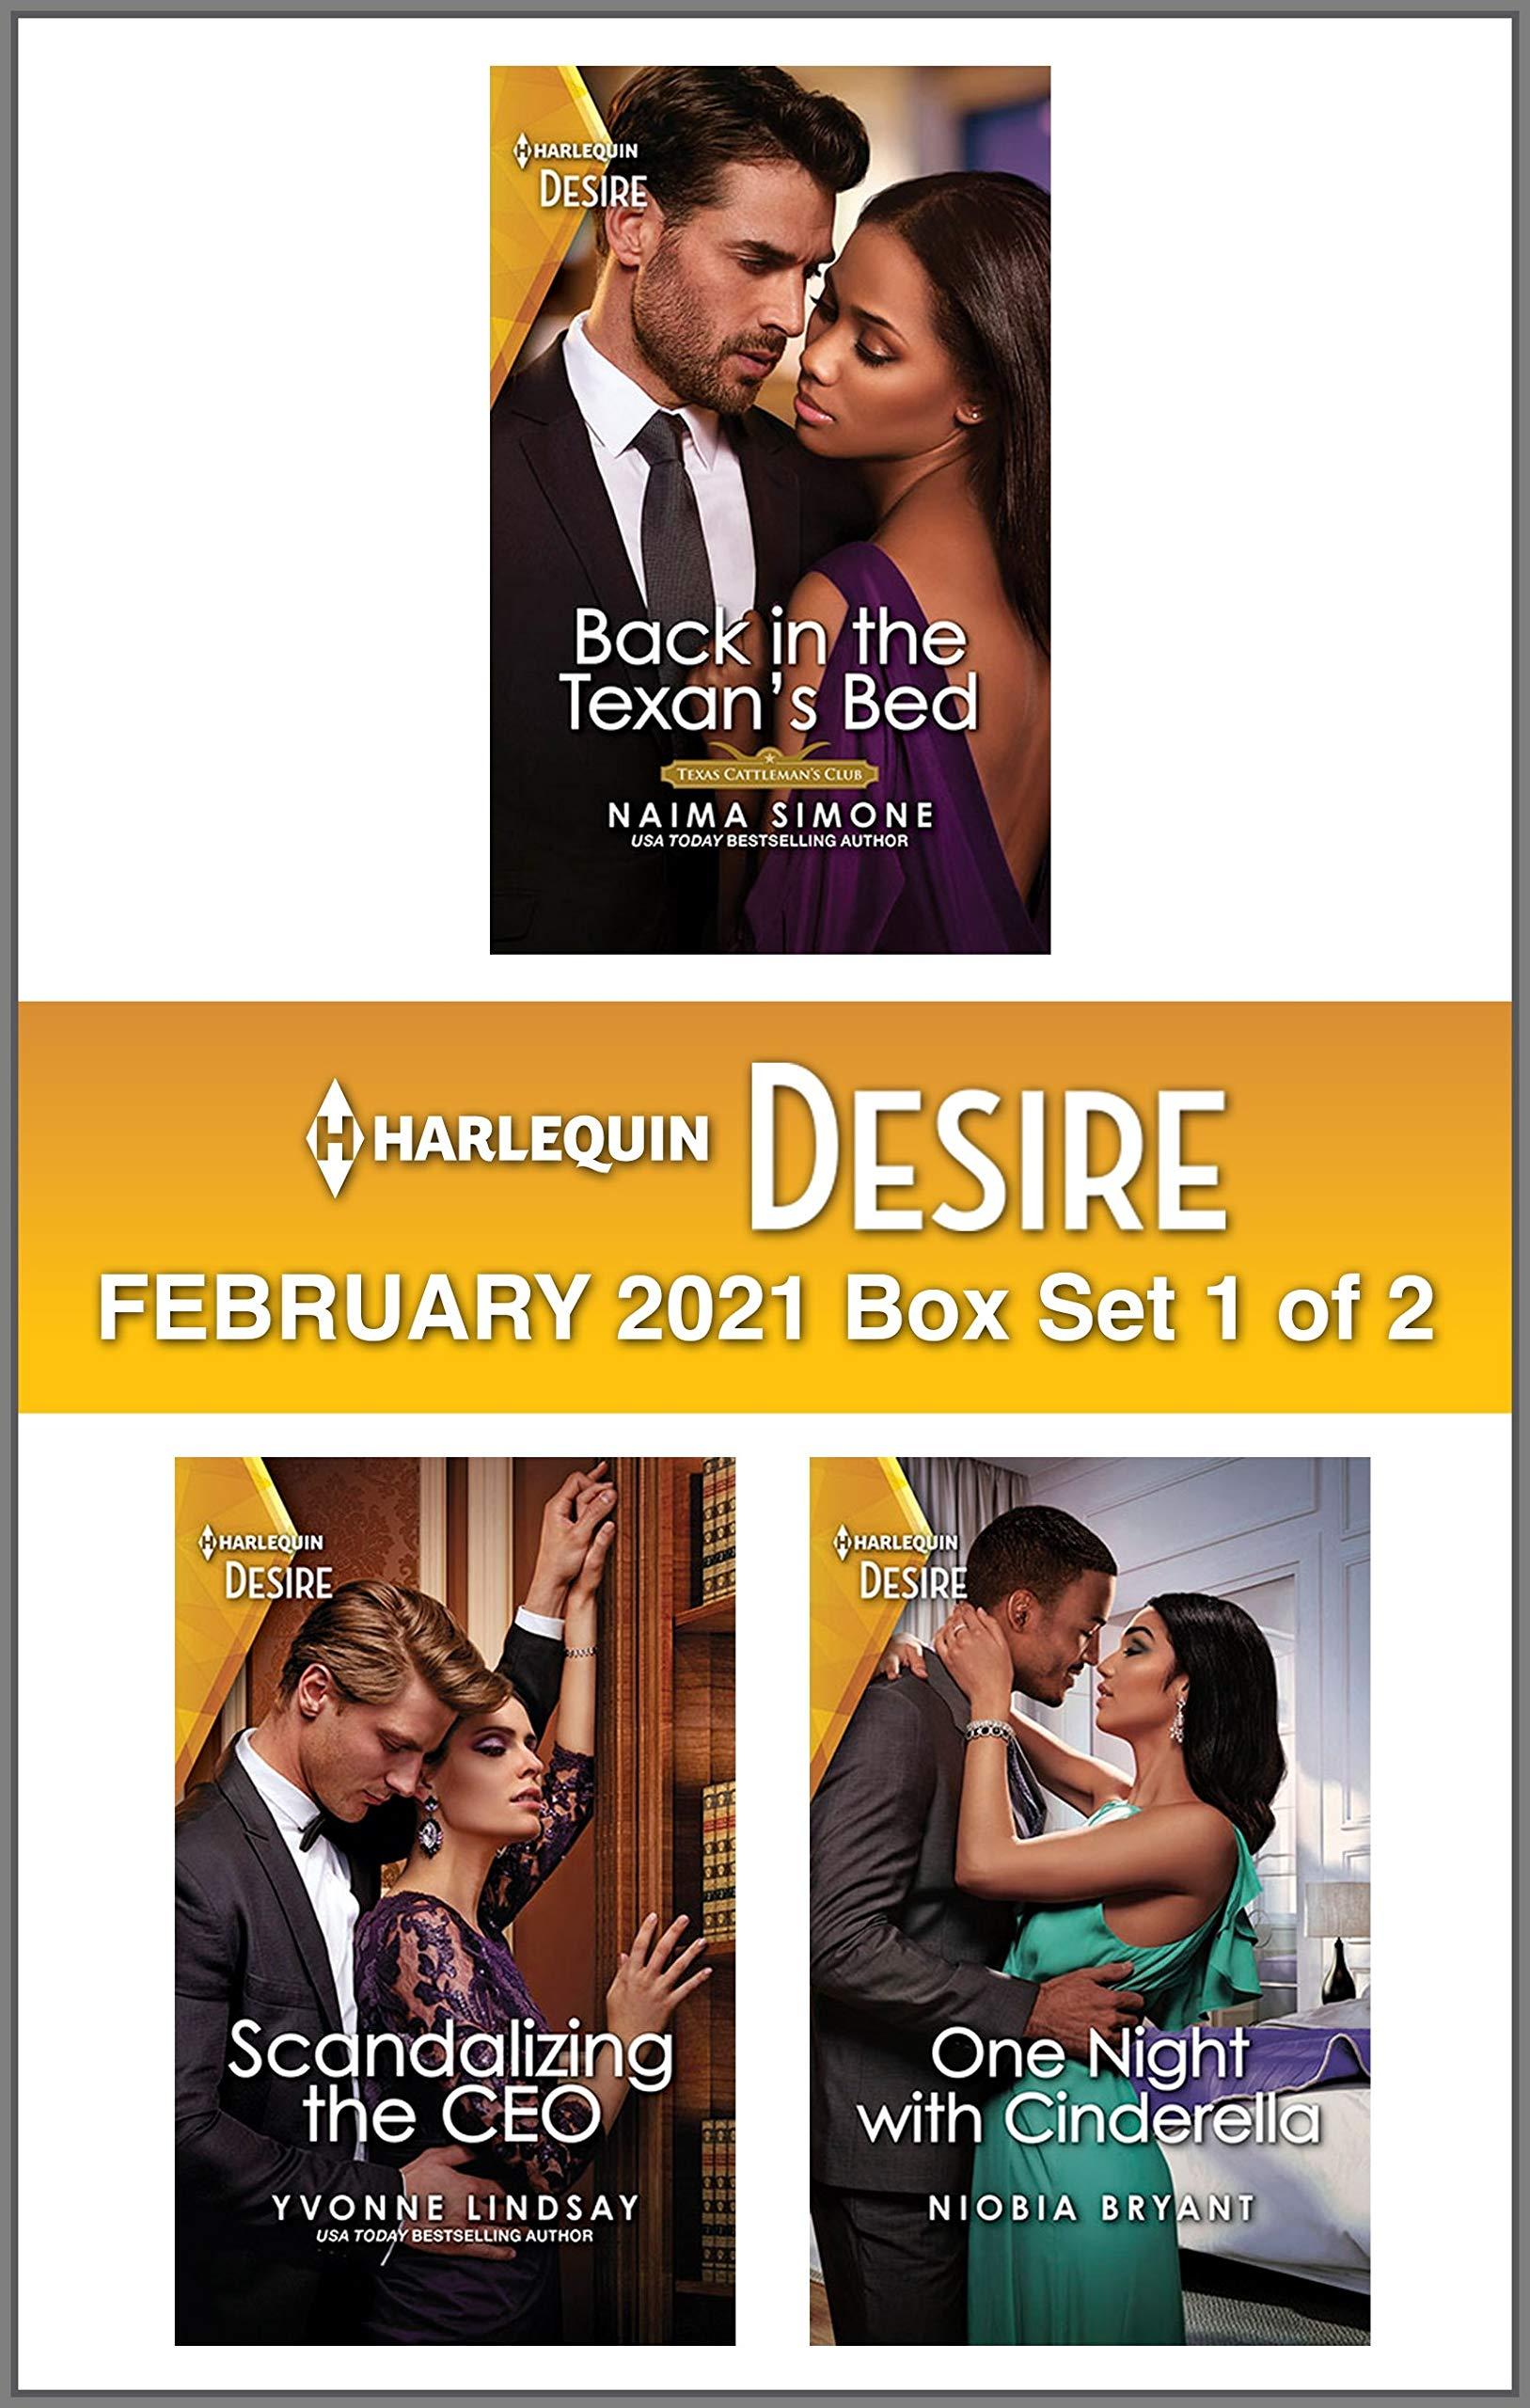 Harlequin Desire February 2021 - Box Set 1 of 2